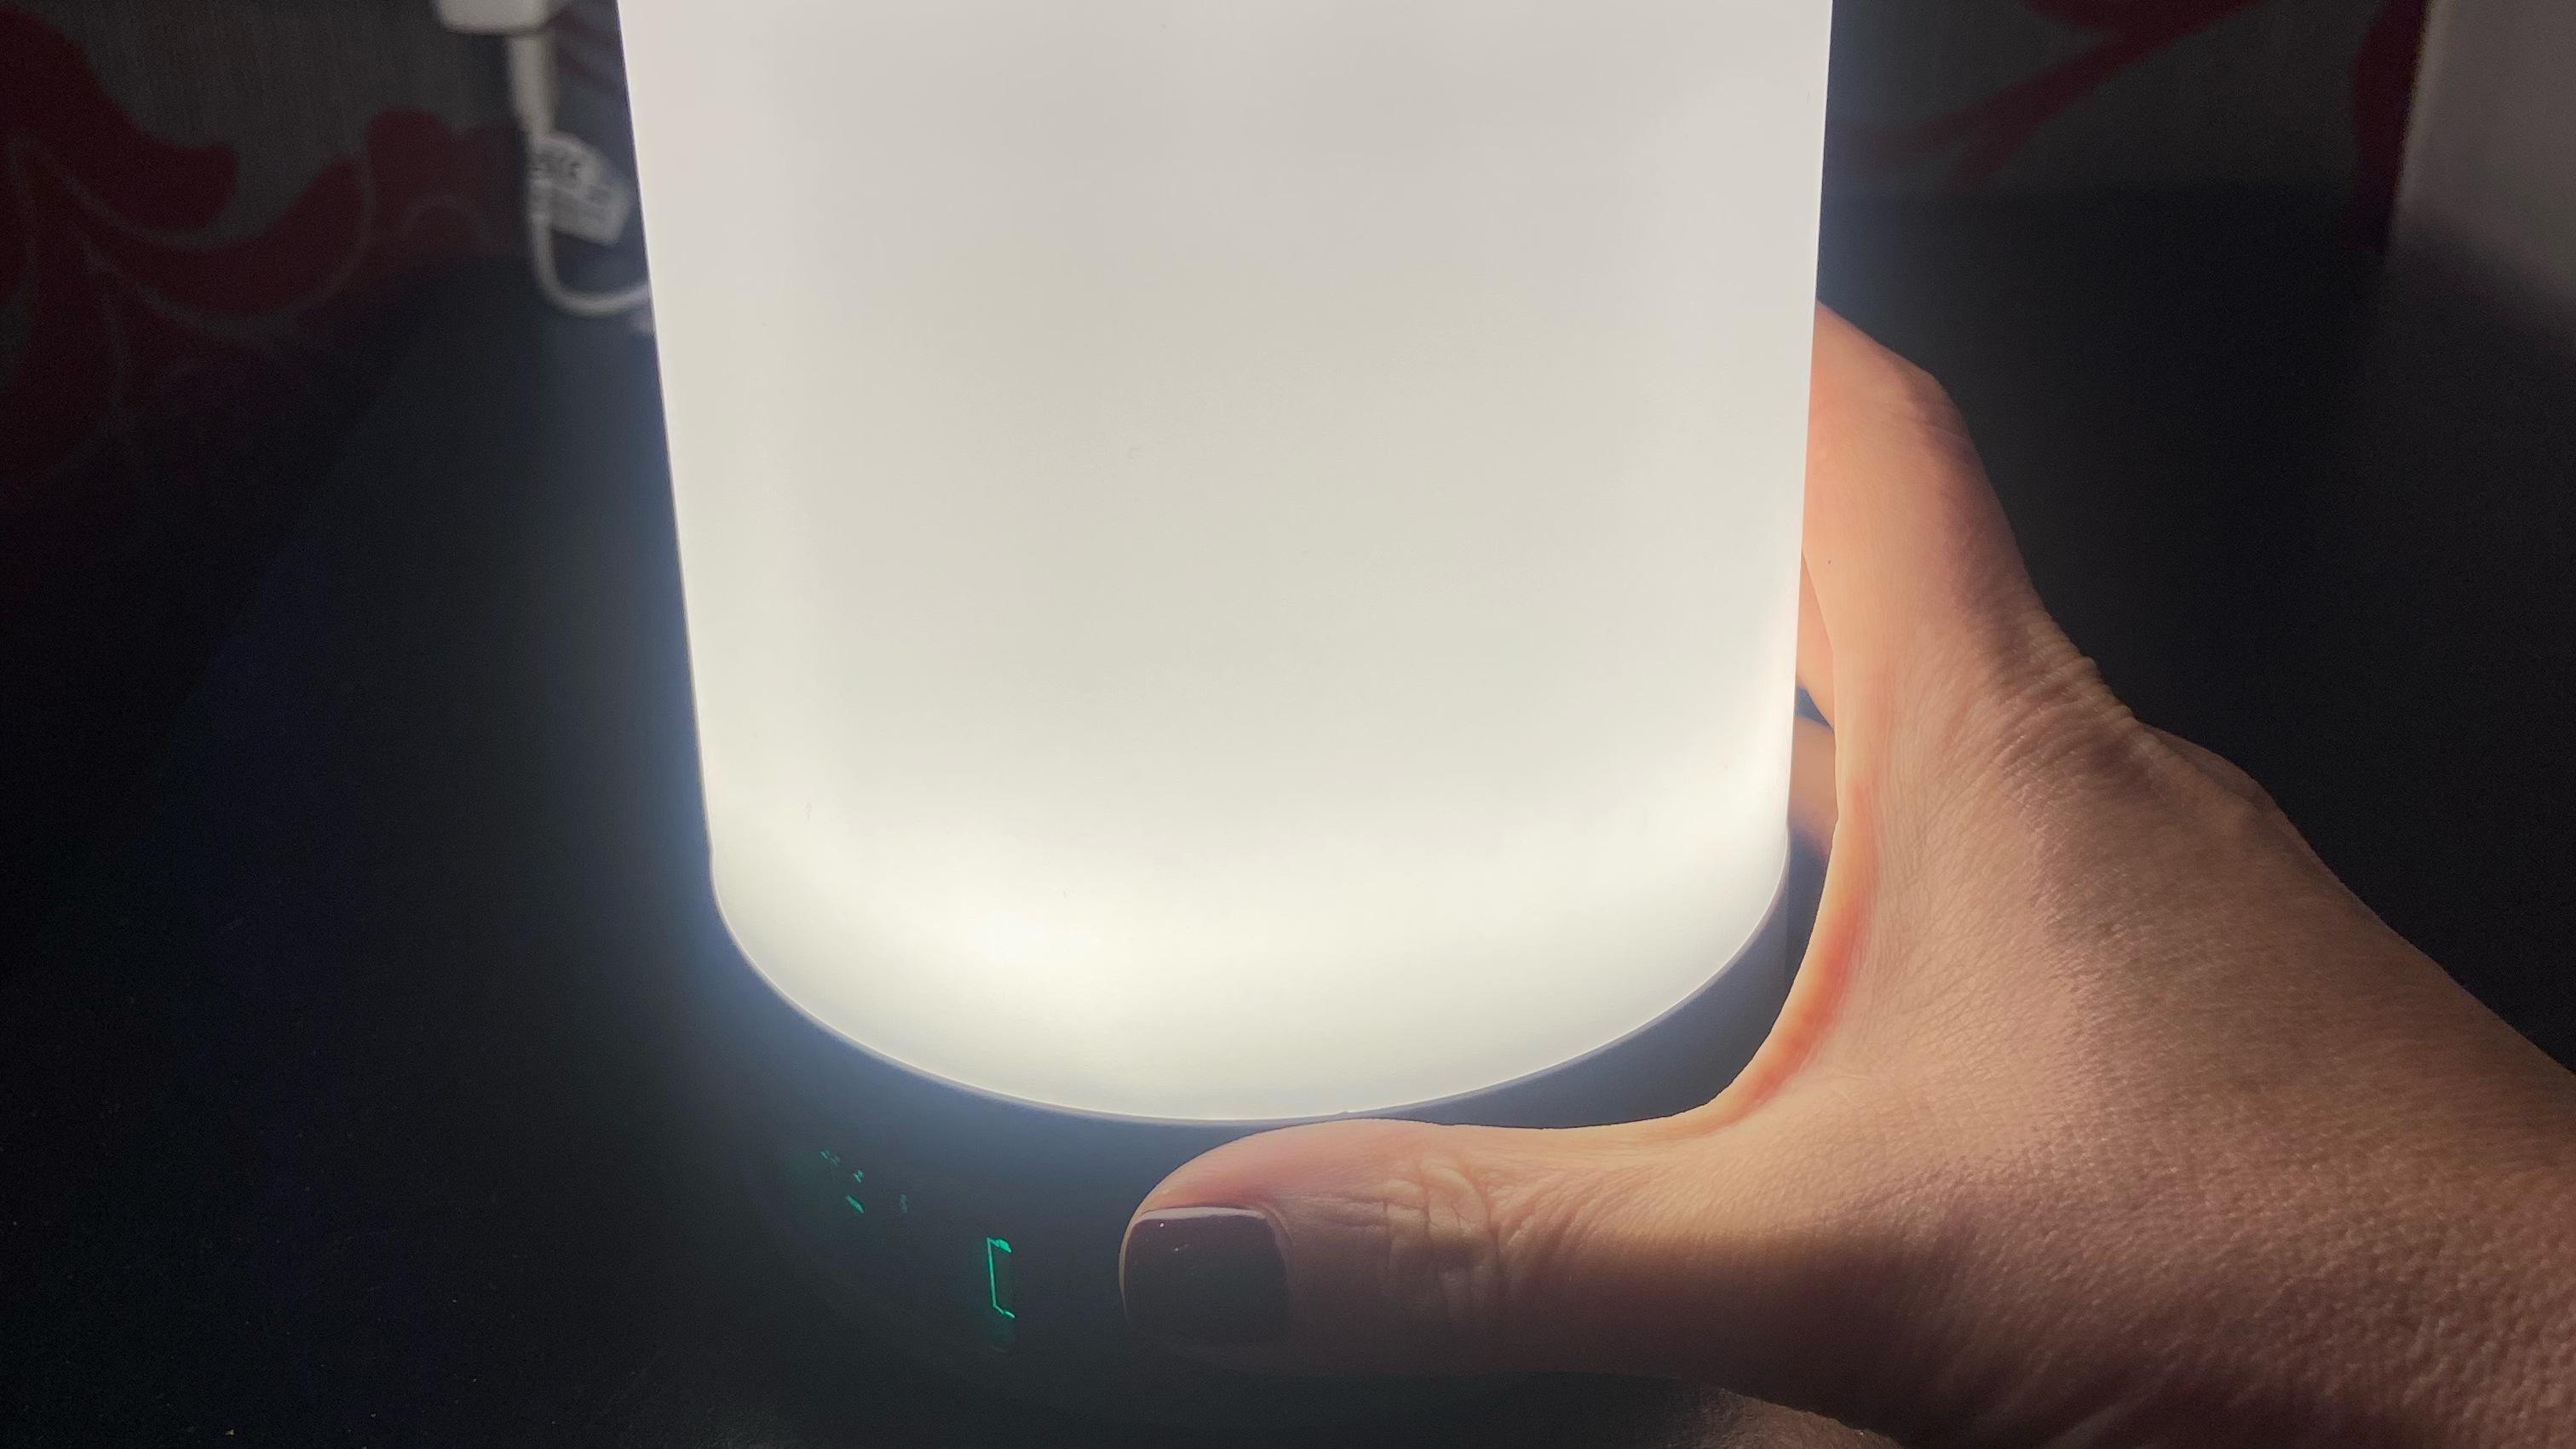 Woman's hand holding Beurer Wake Up Light WL50, emitting white light